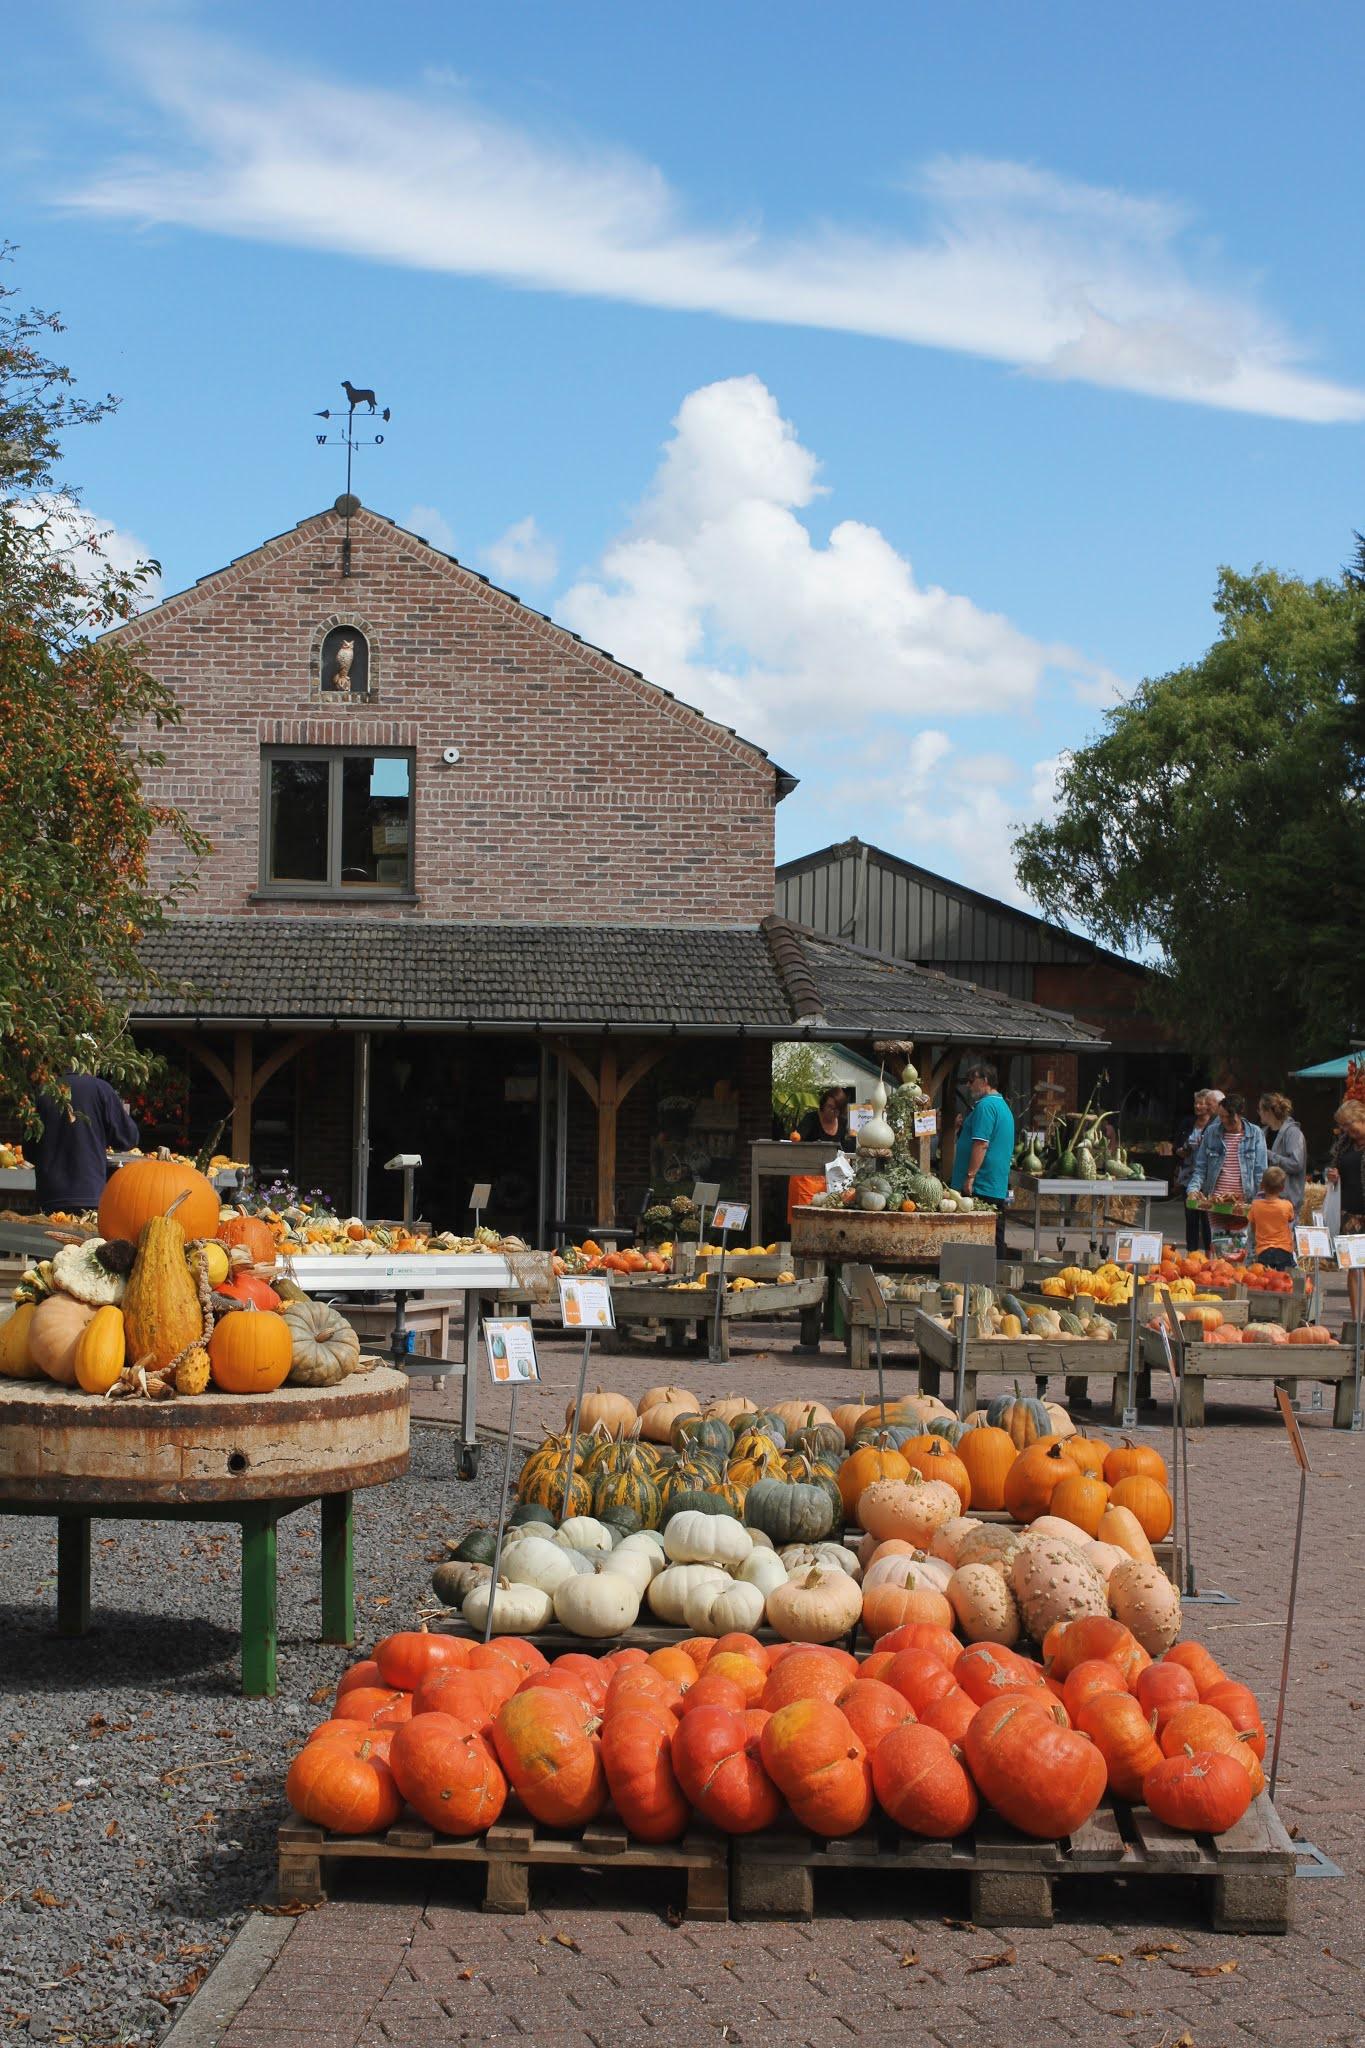 A visit to Charlottes Pompoenen pumpkin farm